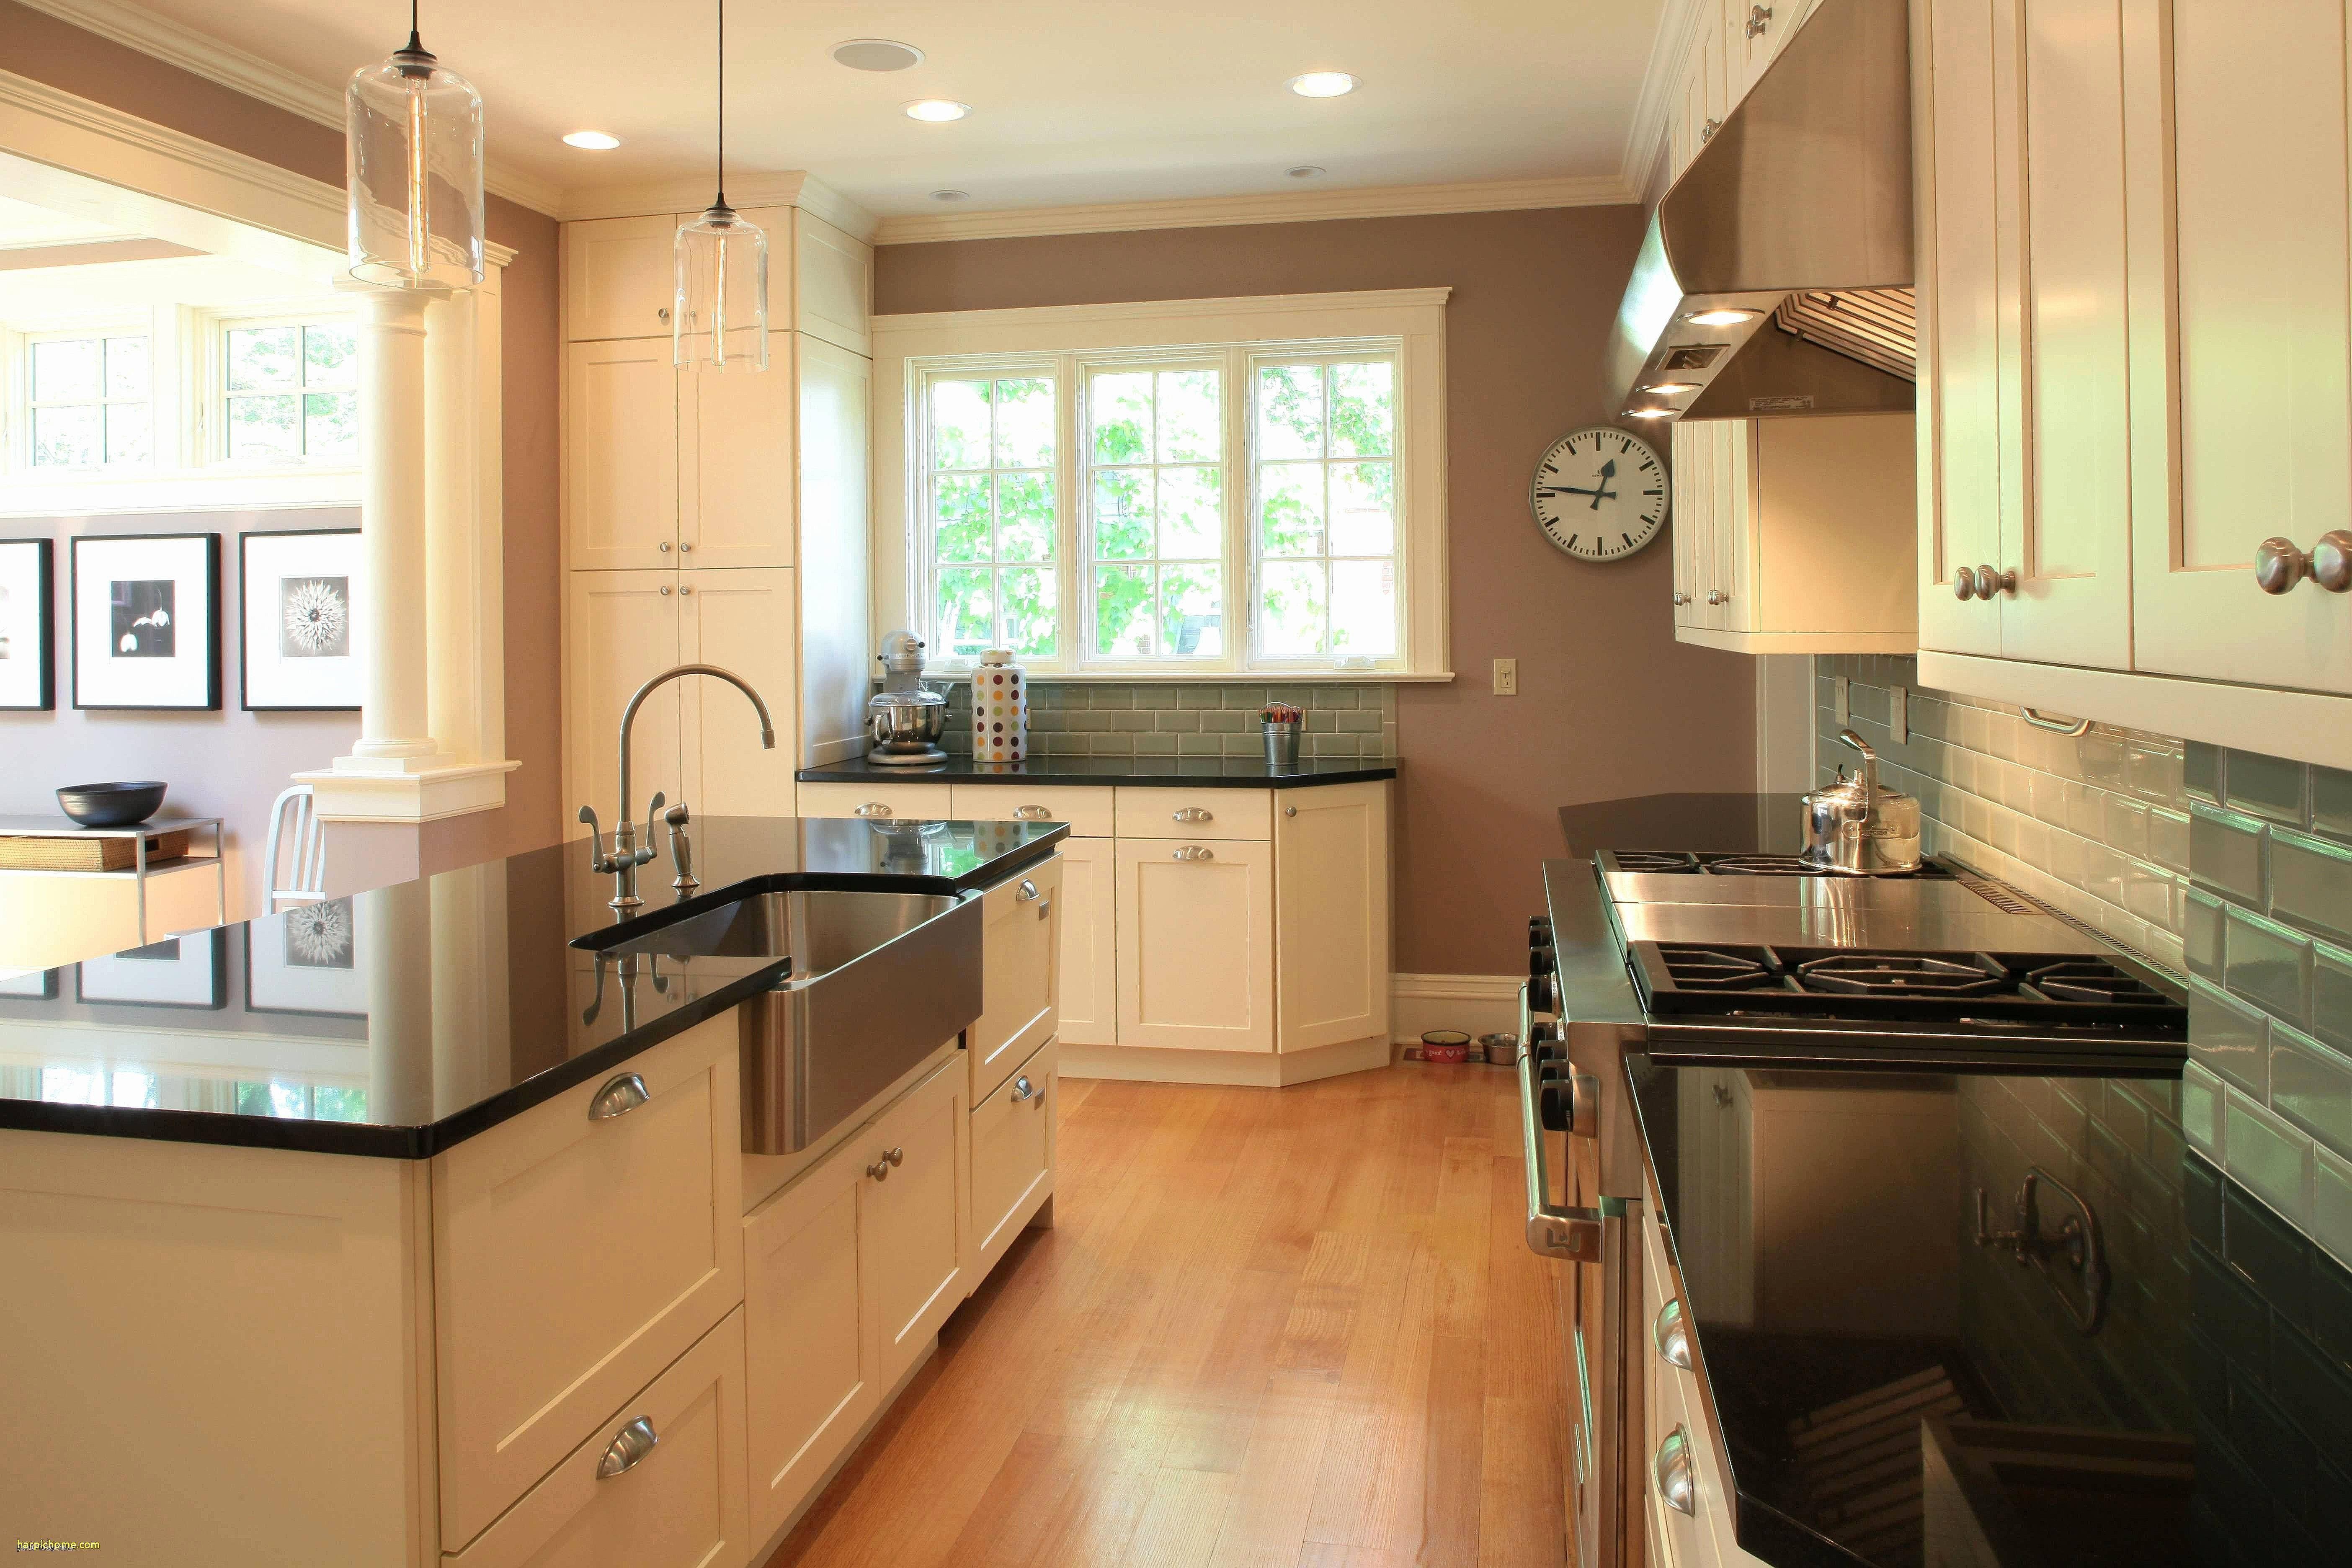 Awesome Small Space Living Room Ideas Smallspaceinteriordesign Smallspacepatiofurniture Smallsp Kitchen Design Small Glass Kitchen Cabinets Kitchen Layout